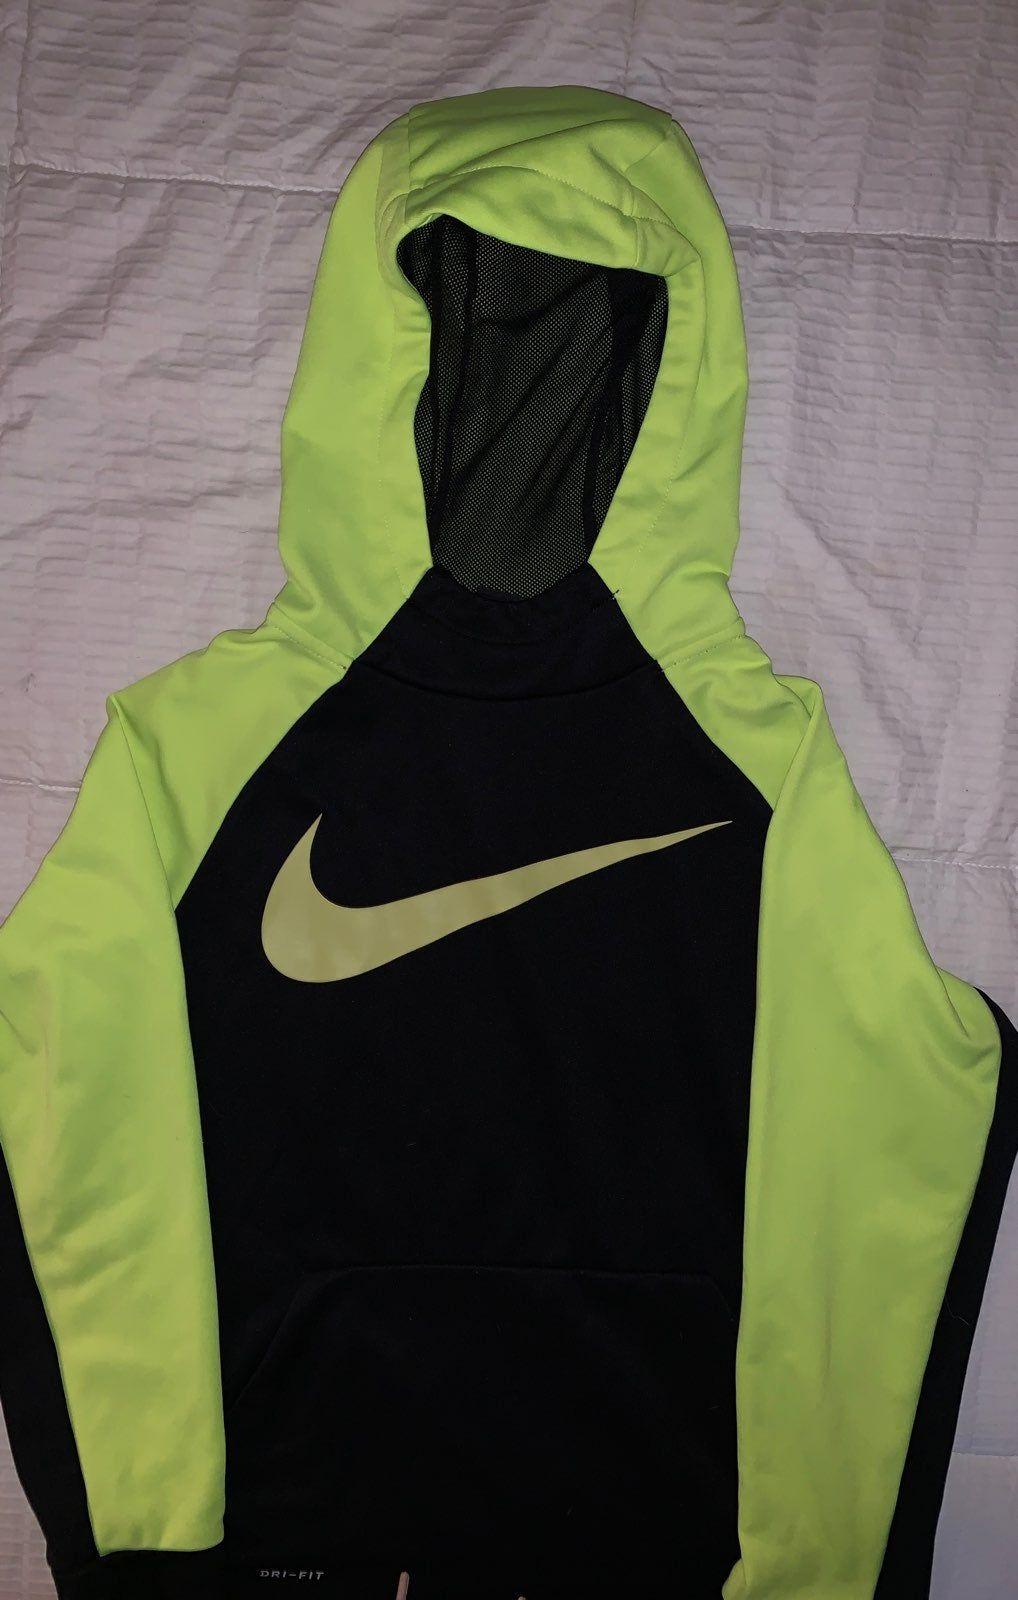 Nike Dri Fit Hoodie Bright Yellow And Black Youth Large Hoodies Nike Dri Fit Hoodie Nike [ 1600 x 1018 Pixel ]